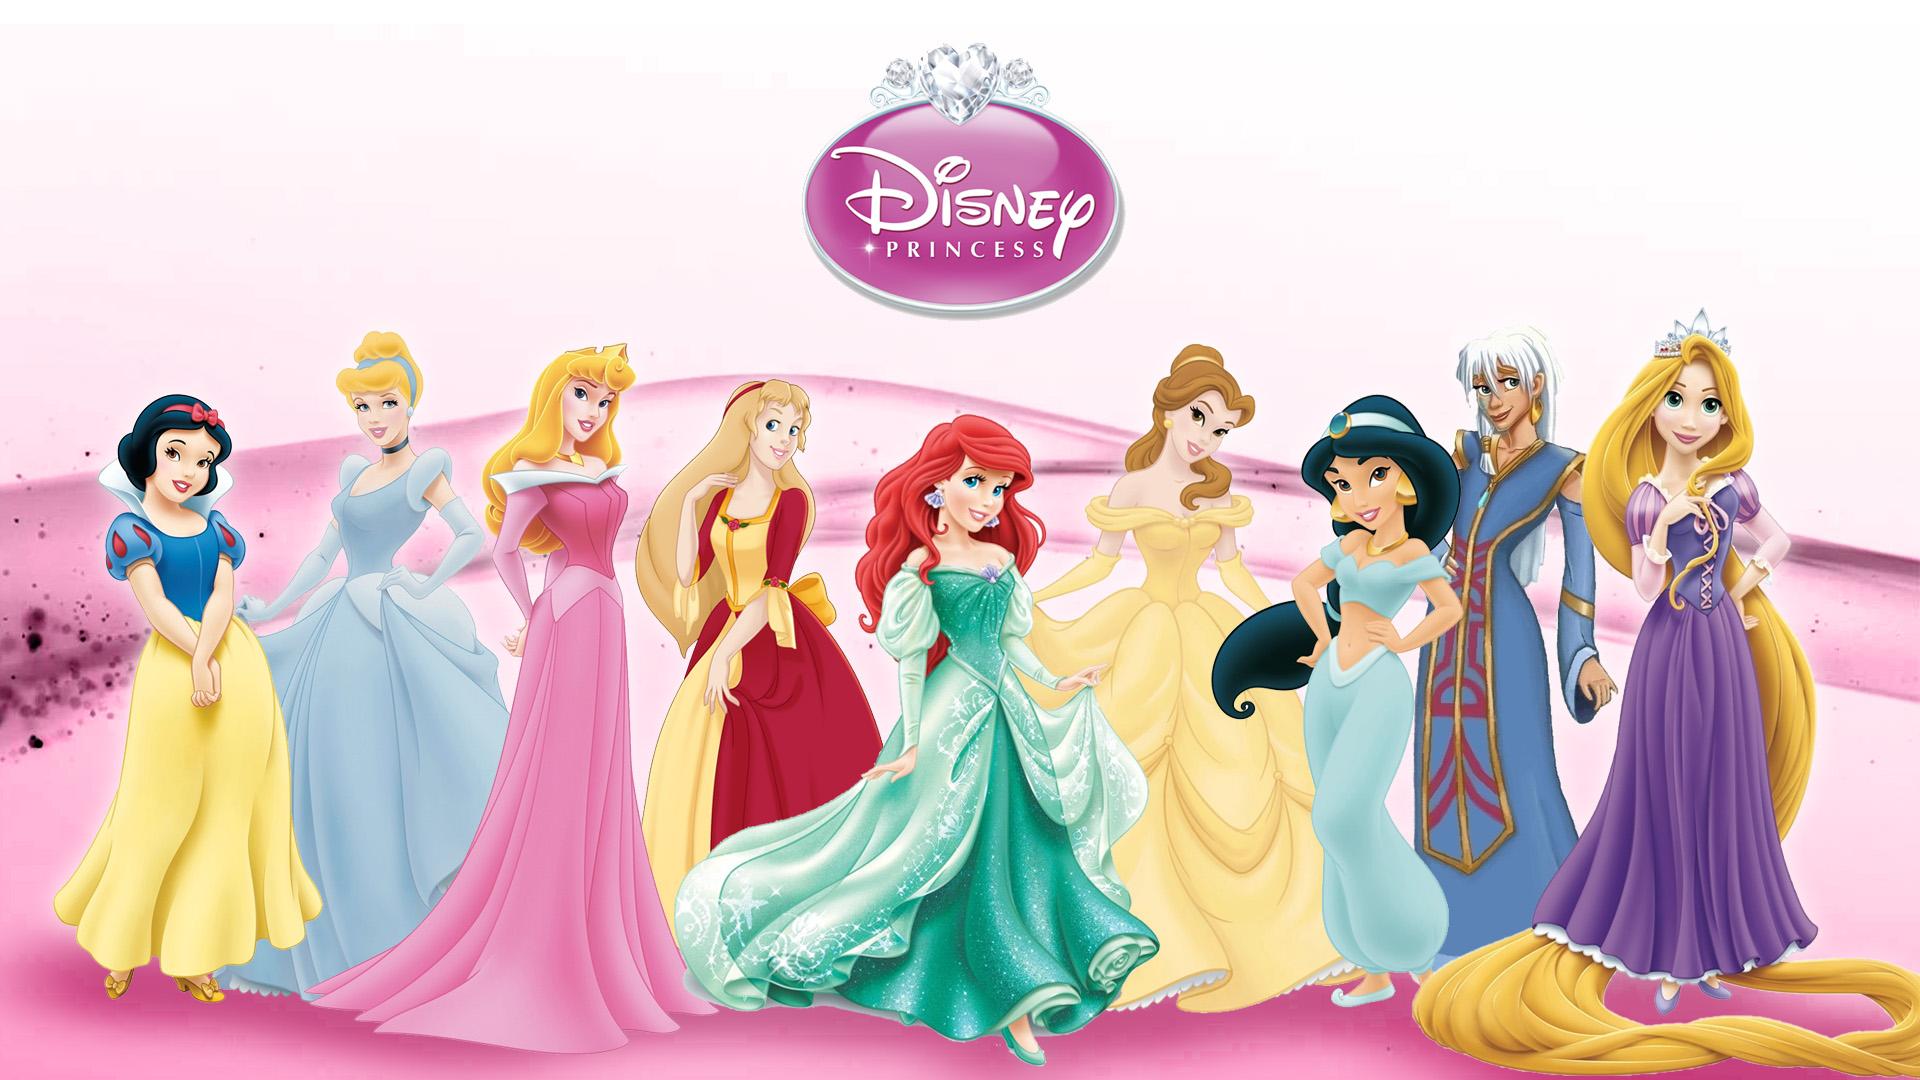 Image result for disney princess wallpaper